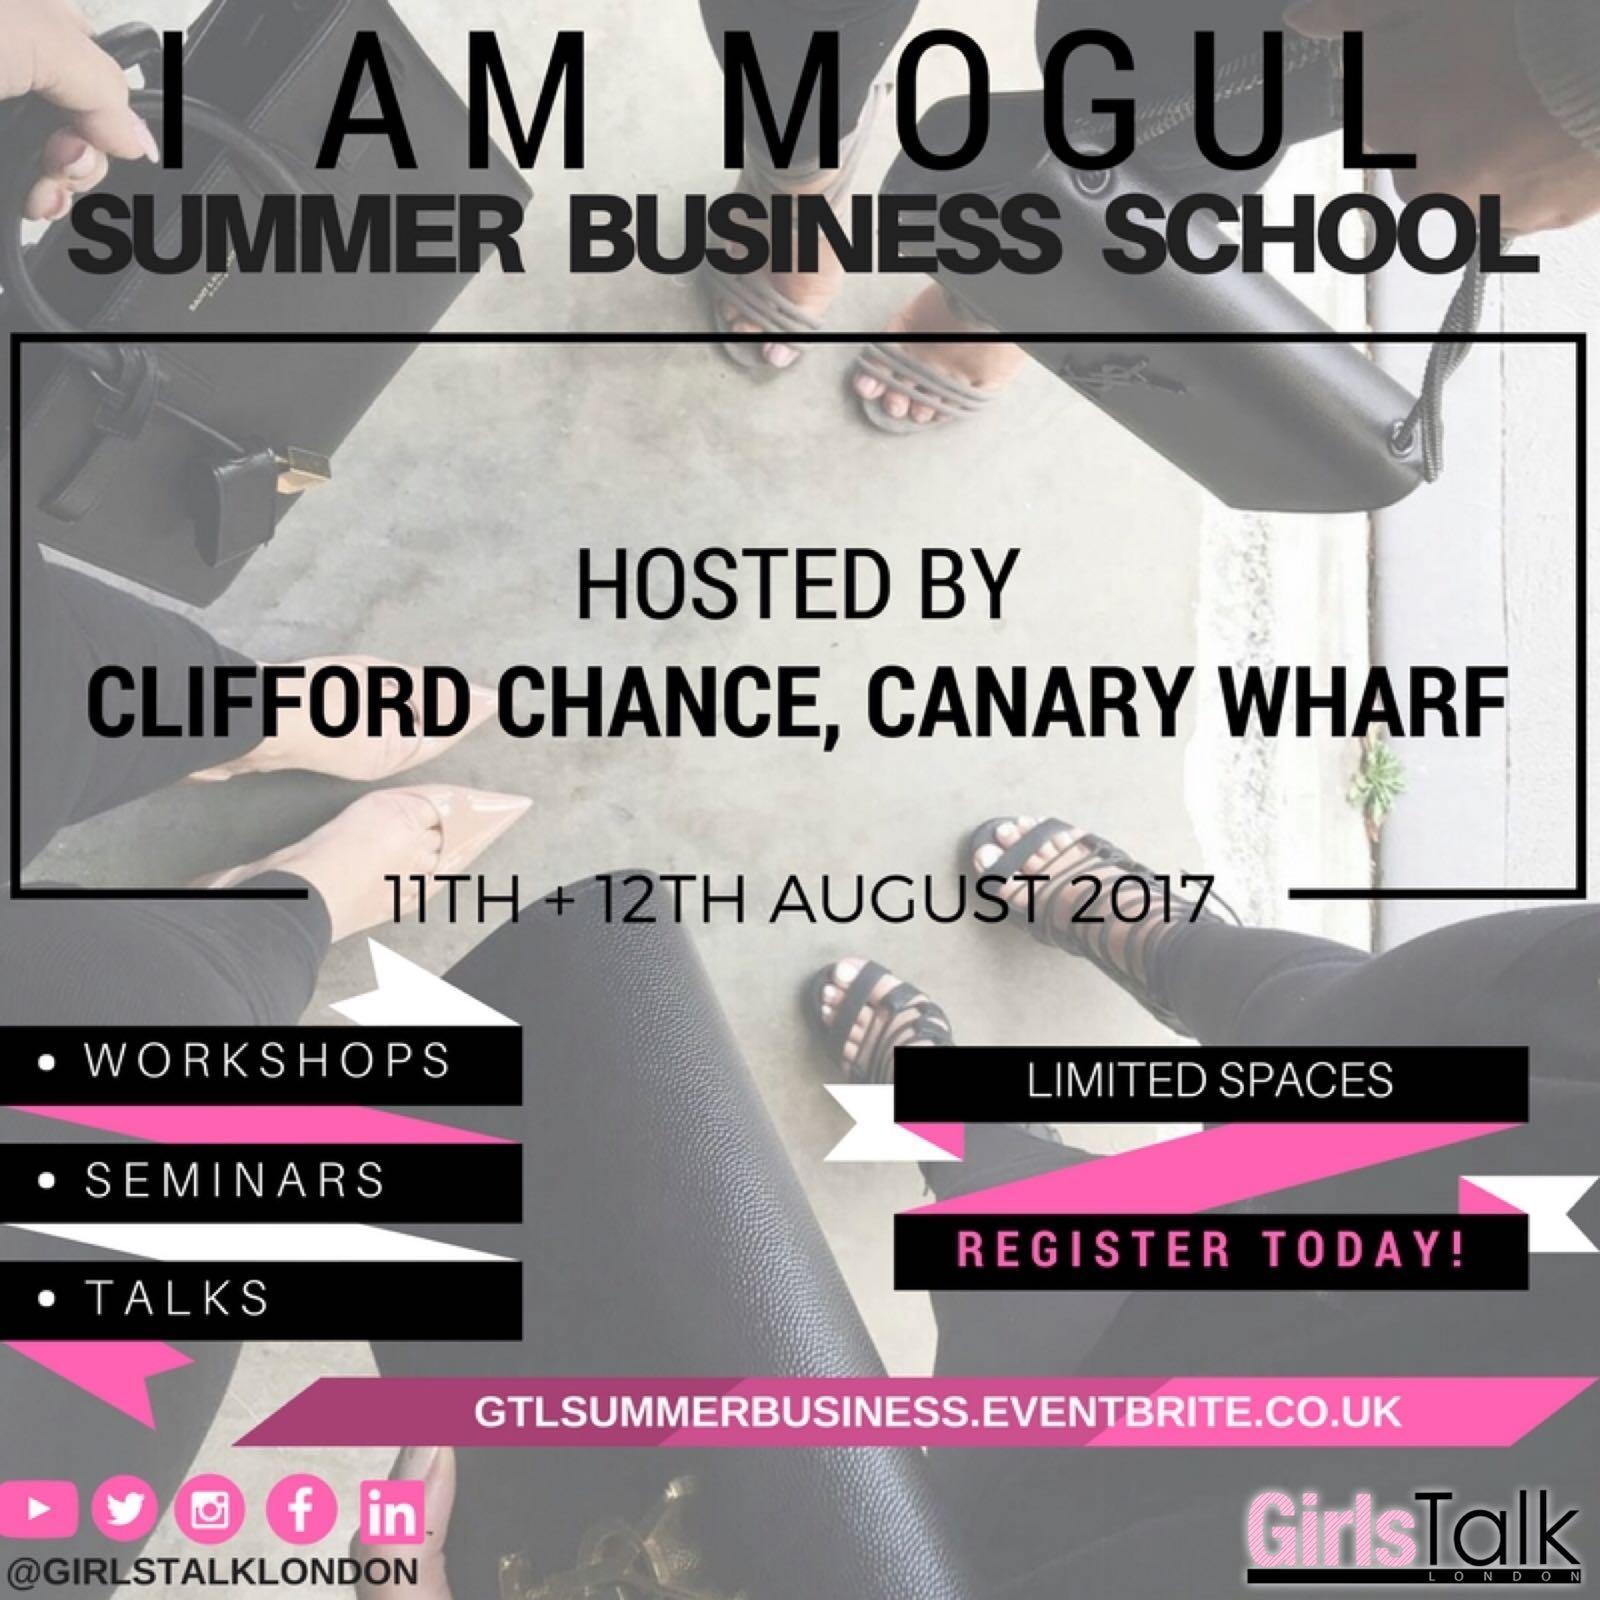 GIRLS TALK LONDON: I AM MOGUL: TWO DAY SUMMER BUSINESS SCHOOL